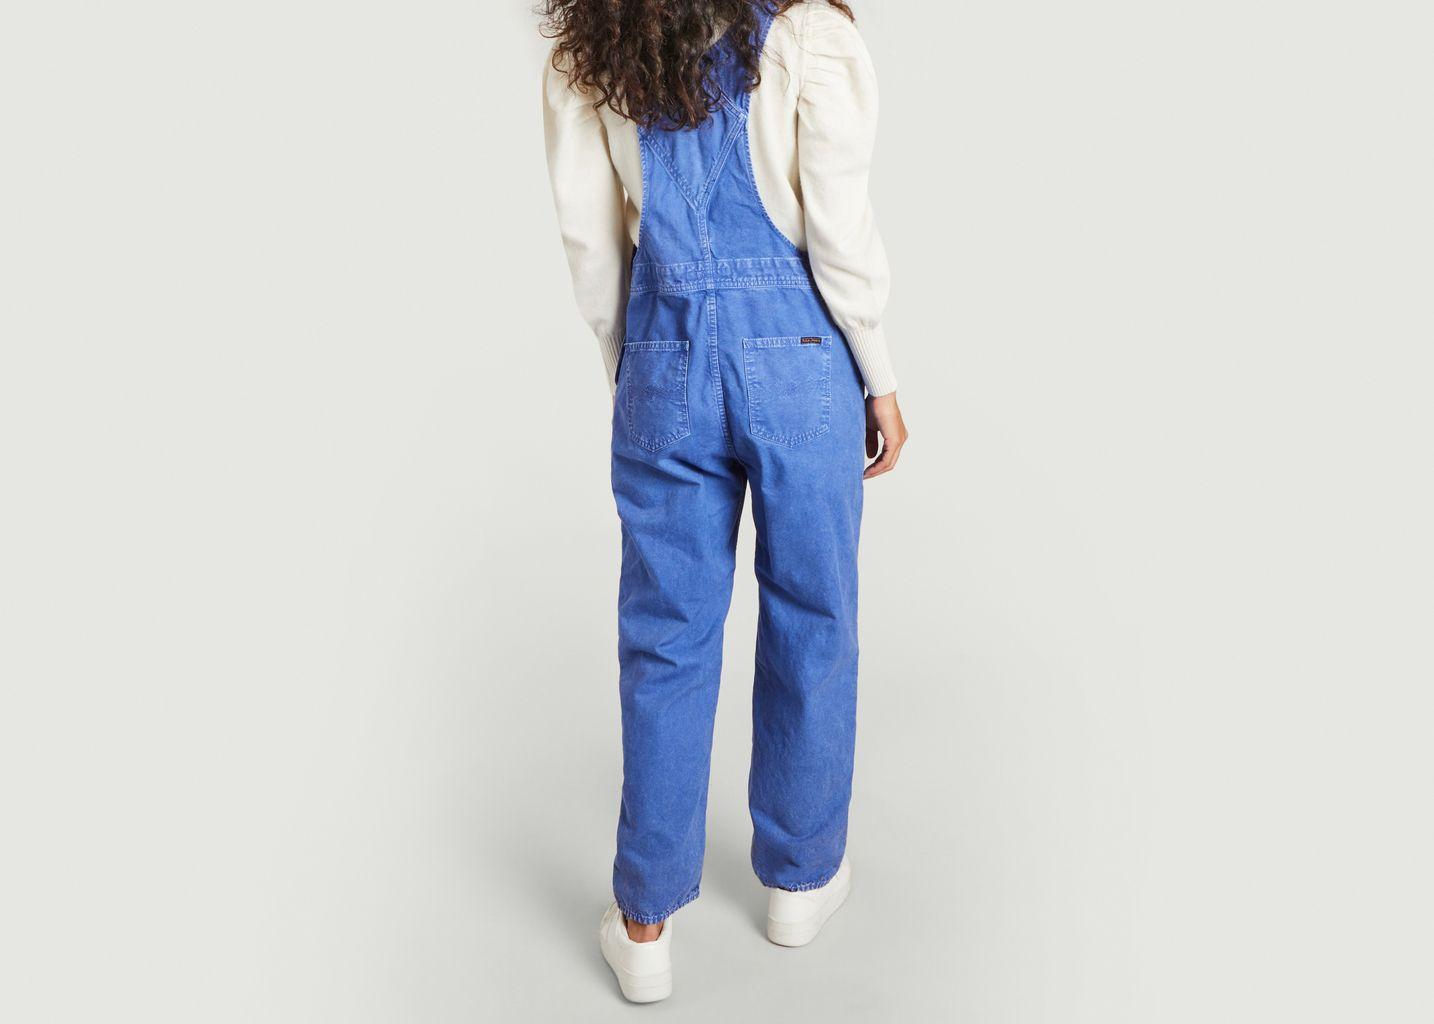 Salopette Karine - Nudie Jeans